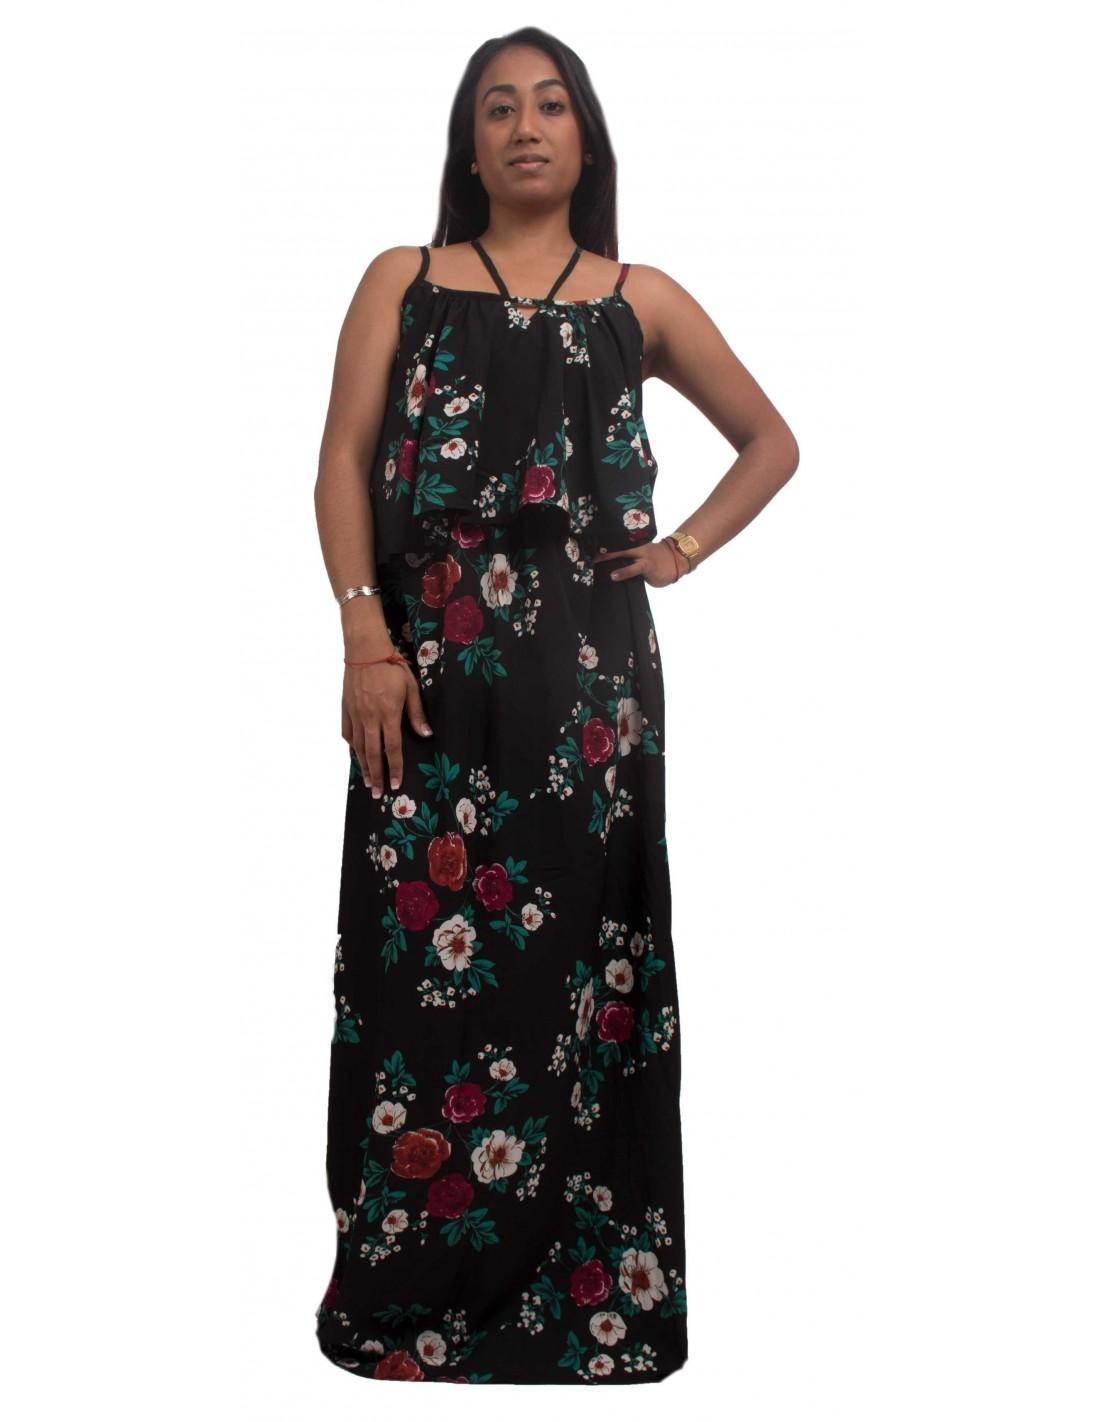 robe longue fleurs fines bretelles type robe d 39 t longue. Black Bedroom Furniture Sets. Home Design Ideas